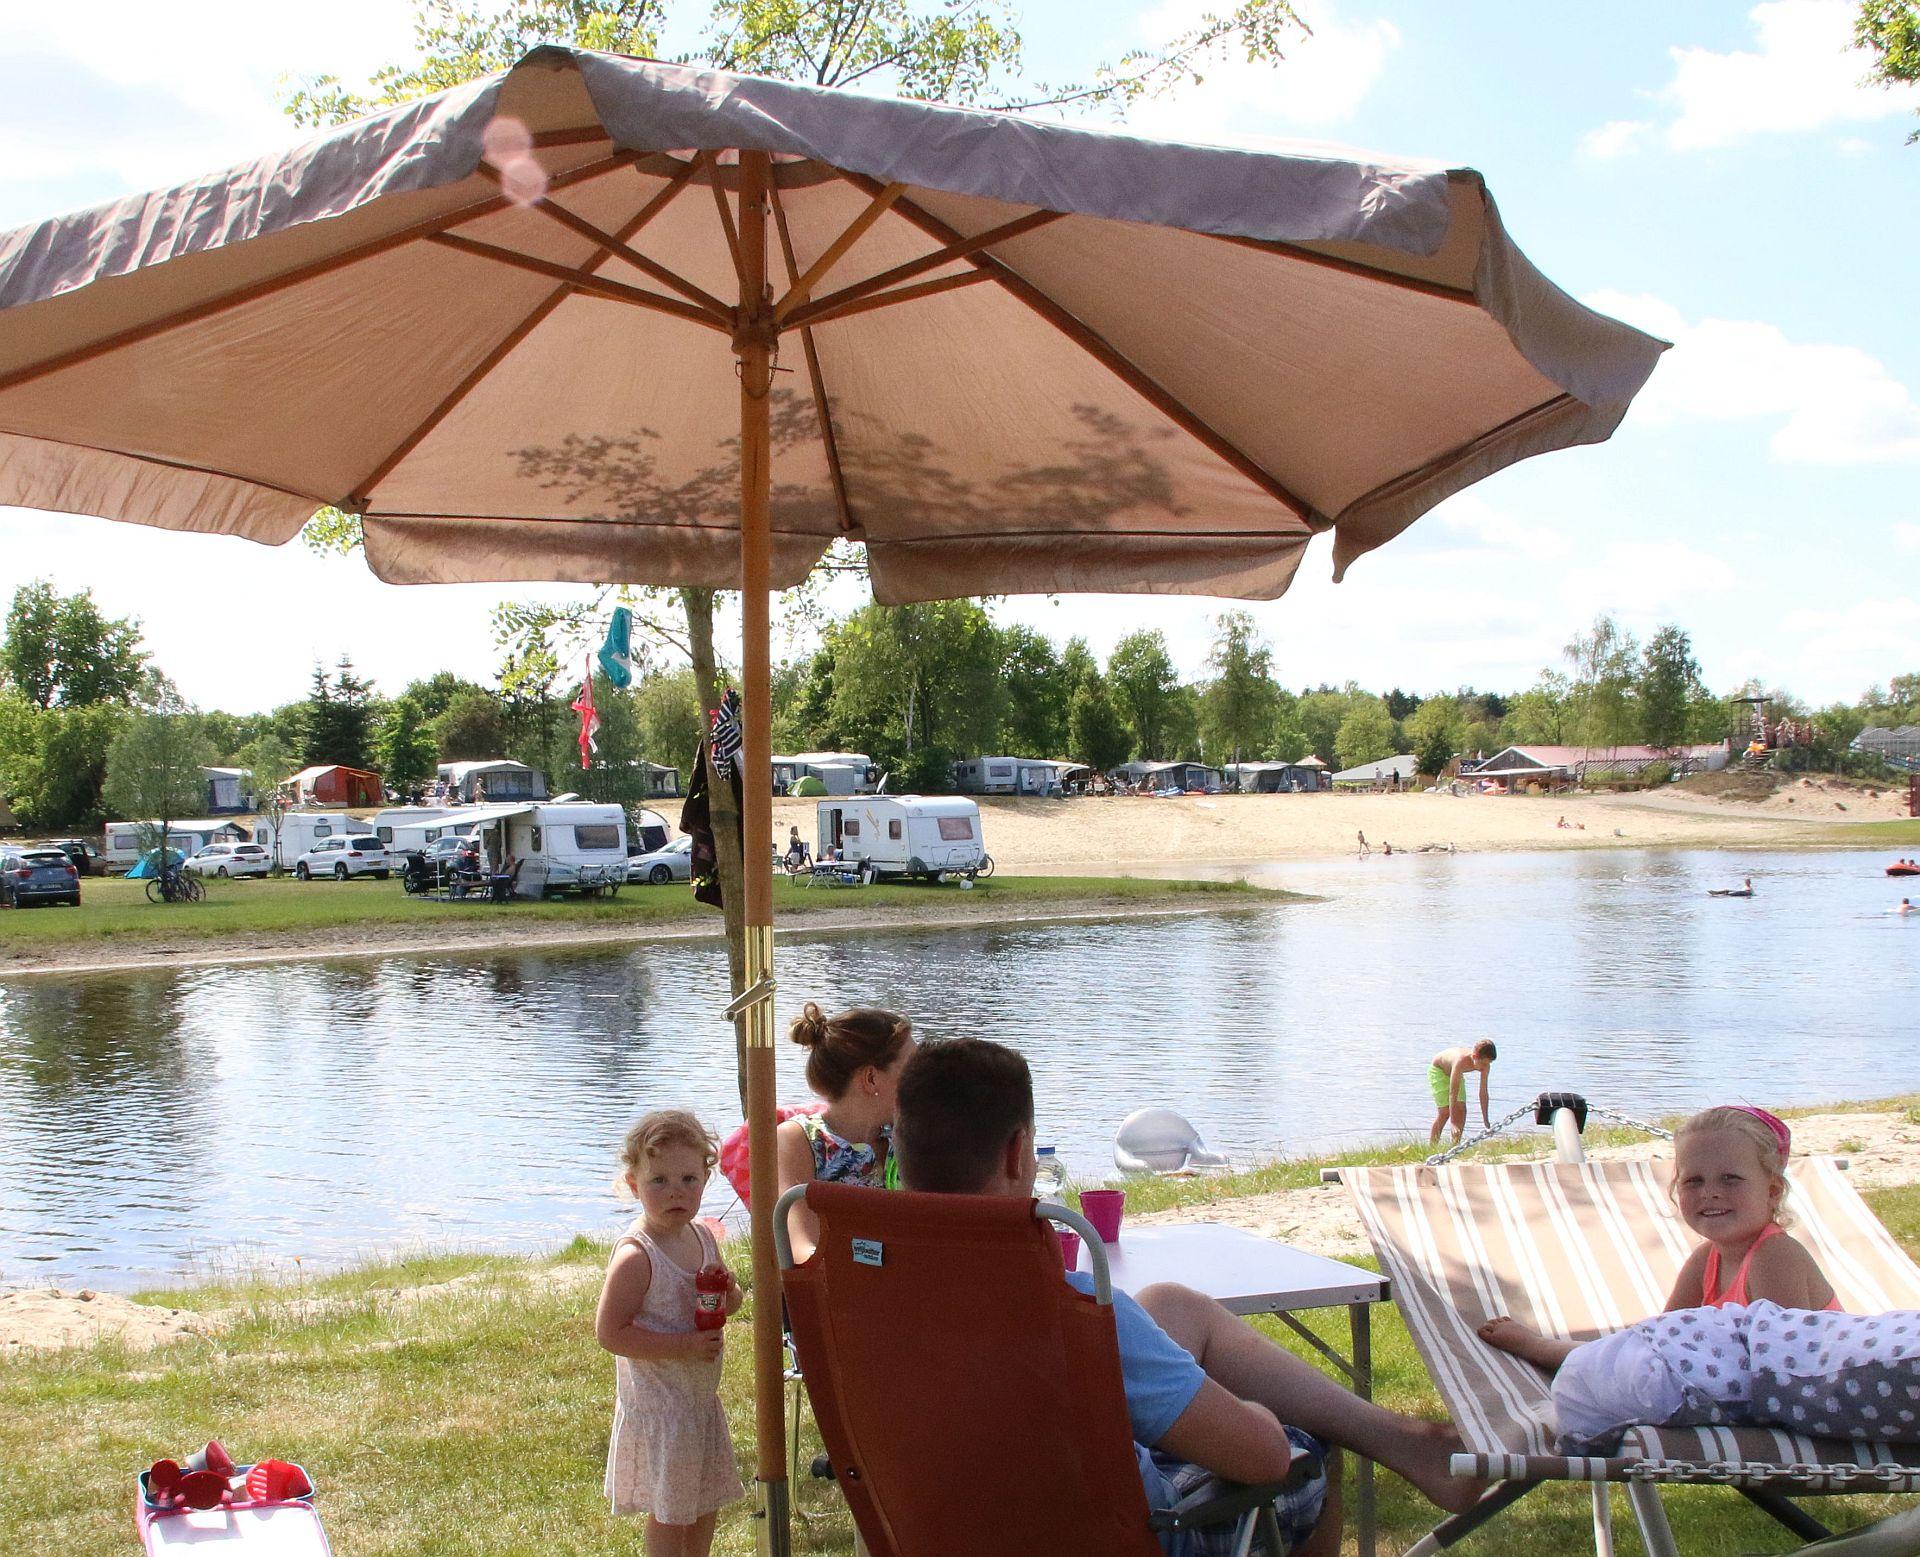 Kamperen in juli in Overijssel - Kamperen in juli in Overijssel Hardenberg